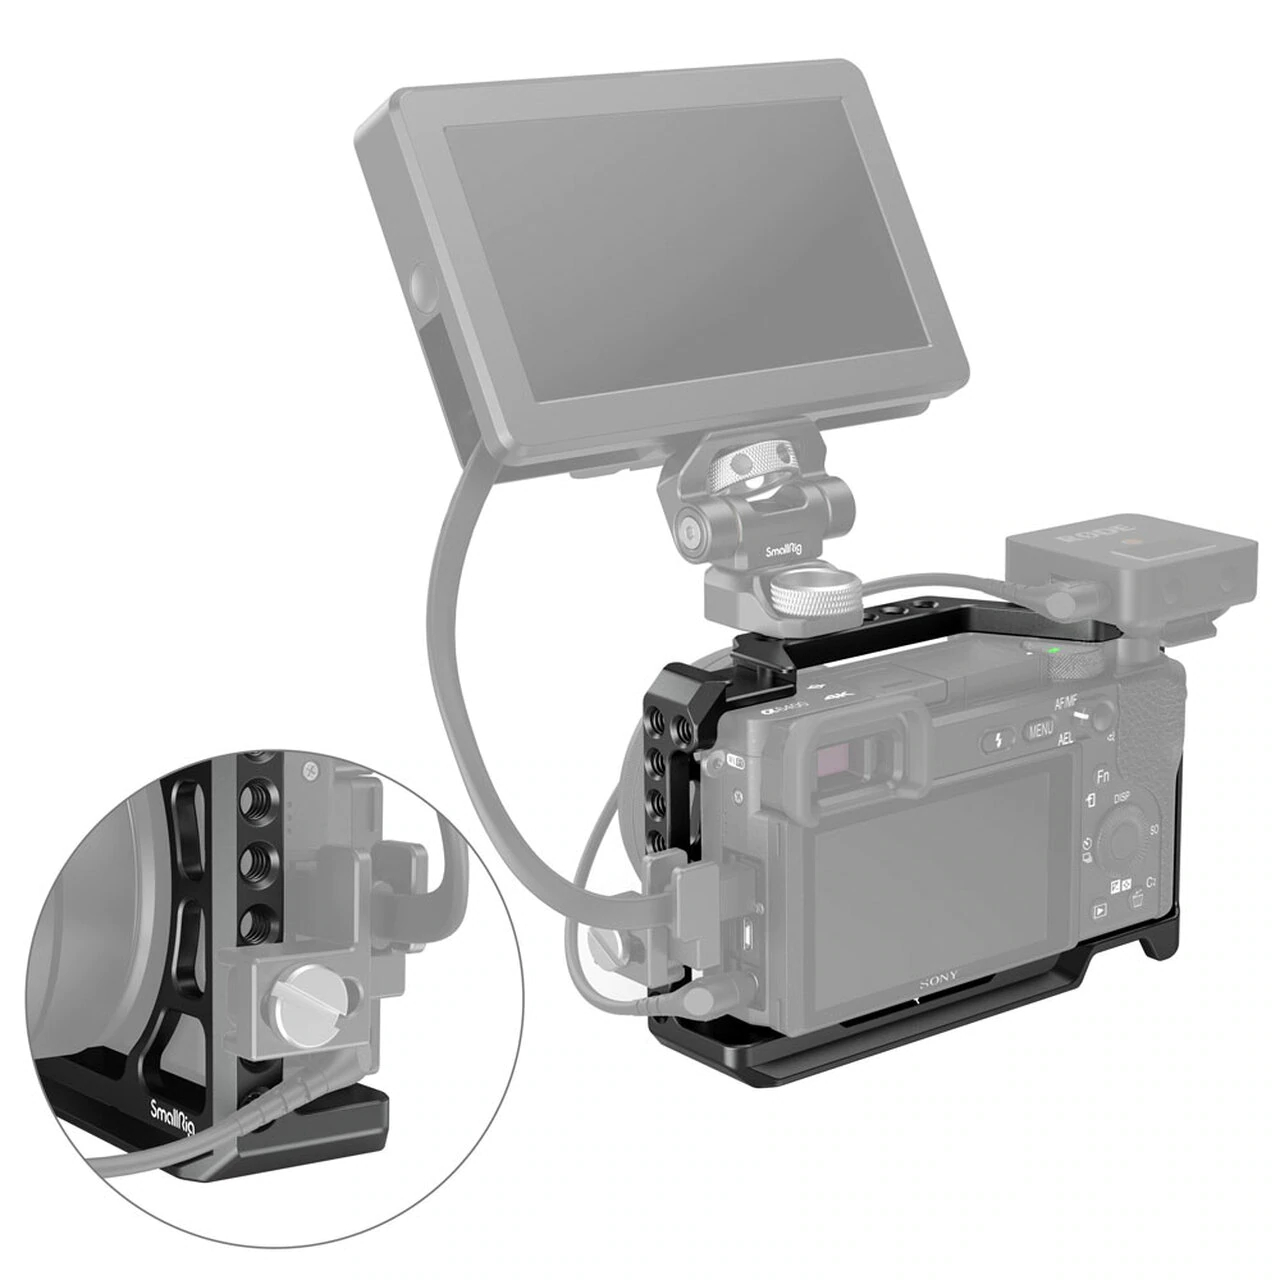 smallrig-3164-05-sony-a6-camera-cage-silicone-grip-klatka-z-gripem.jpg